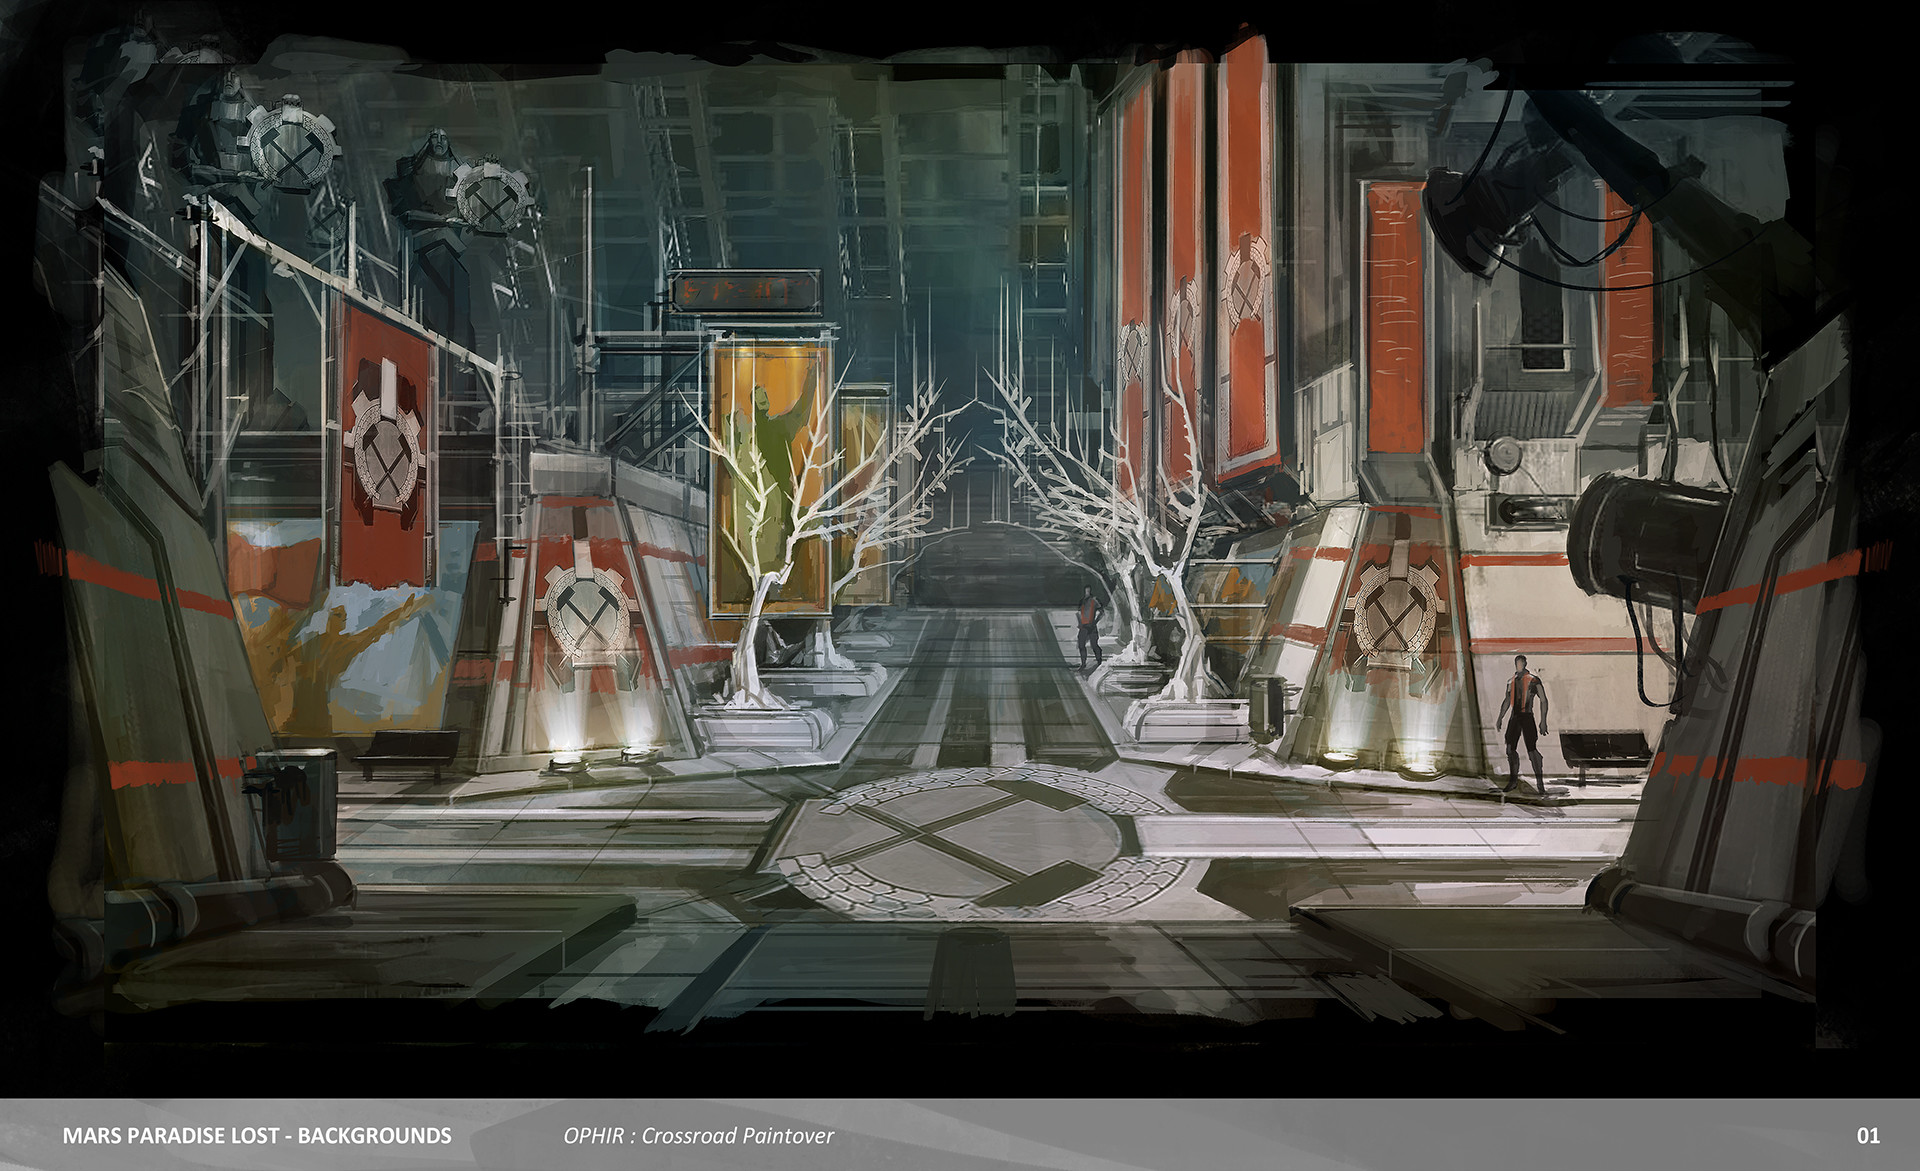 Alexandre chaudret mpl backgrounds crossroad paintover01